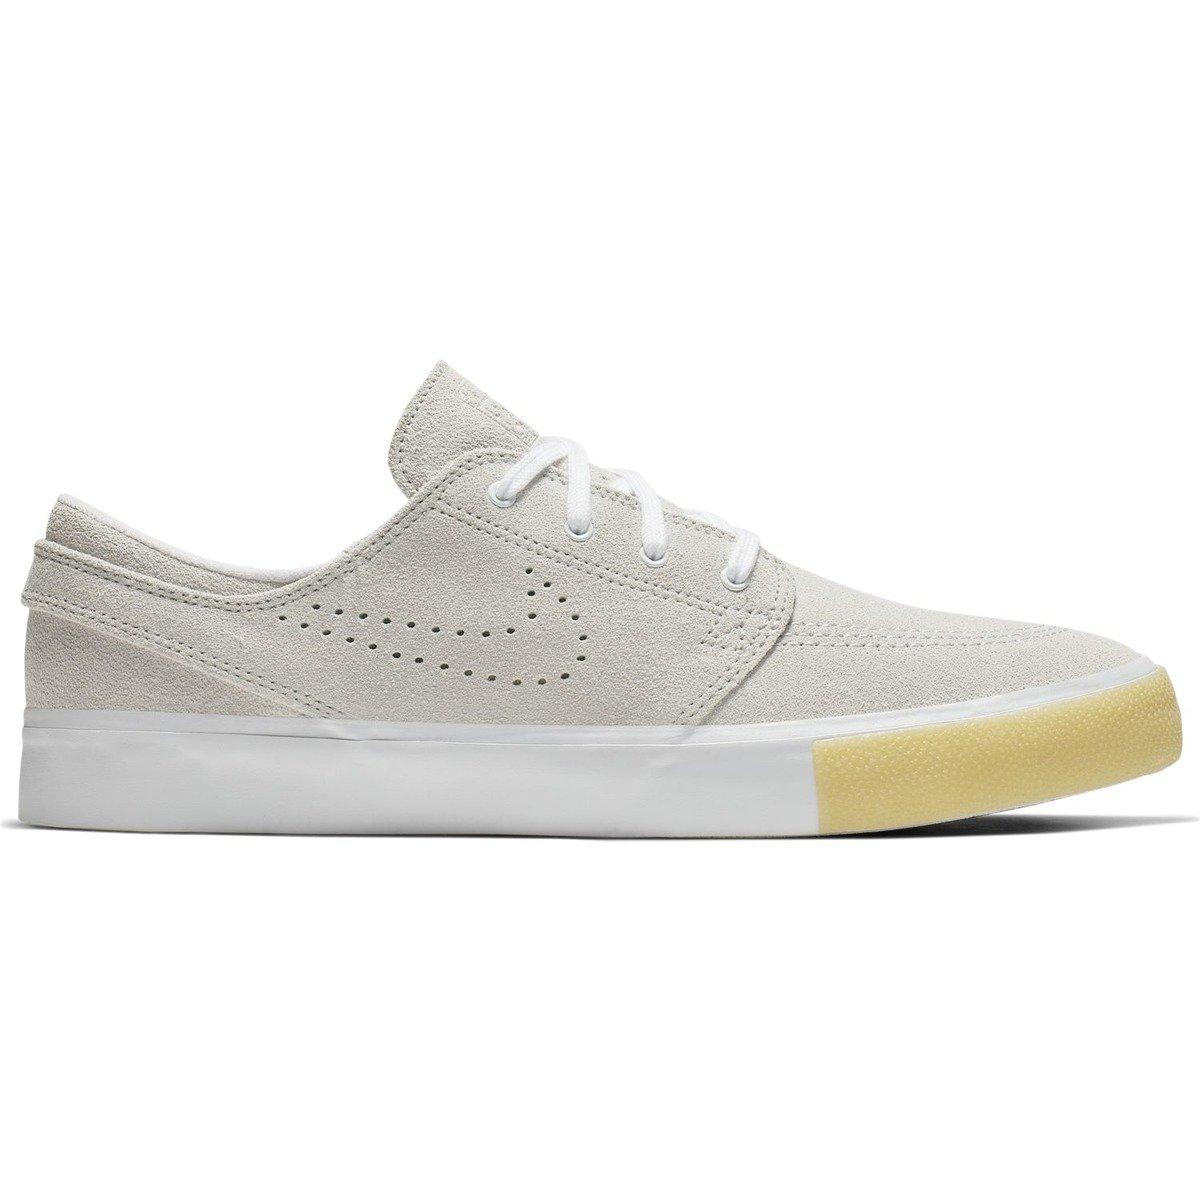 29c95f00df78f Miniramp Skateshop Buty Nike Sb Zoom Stefan Janoski RM SE White/white-vast  Grey-gum Yellow